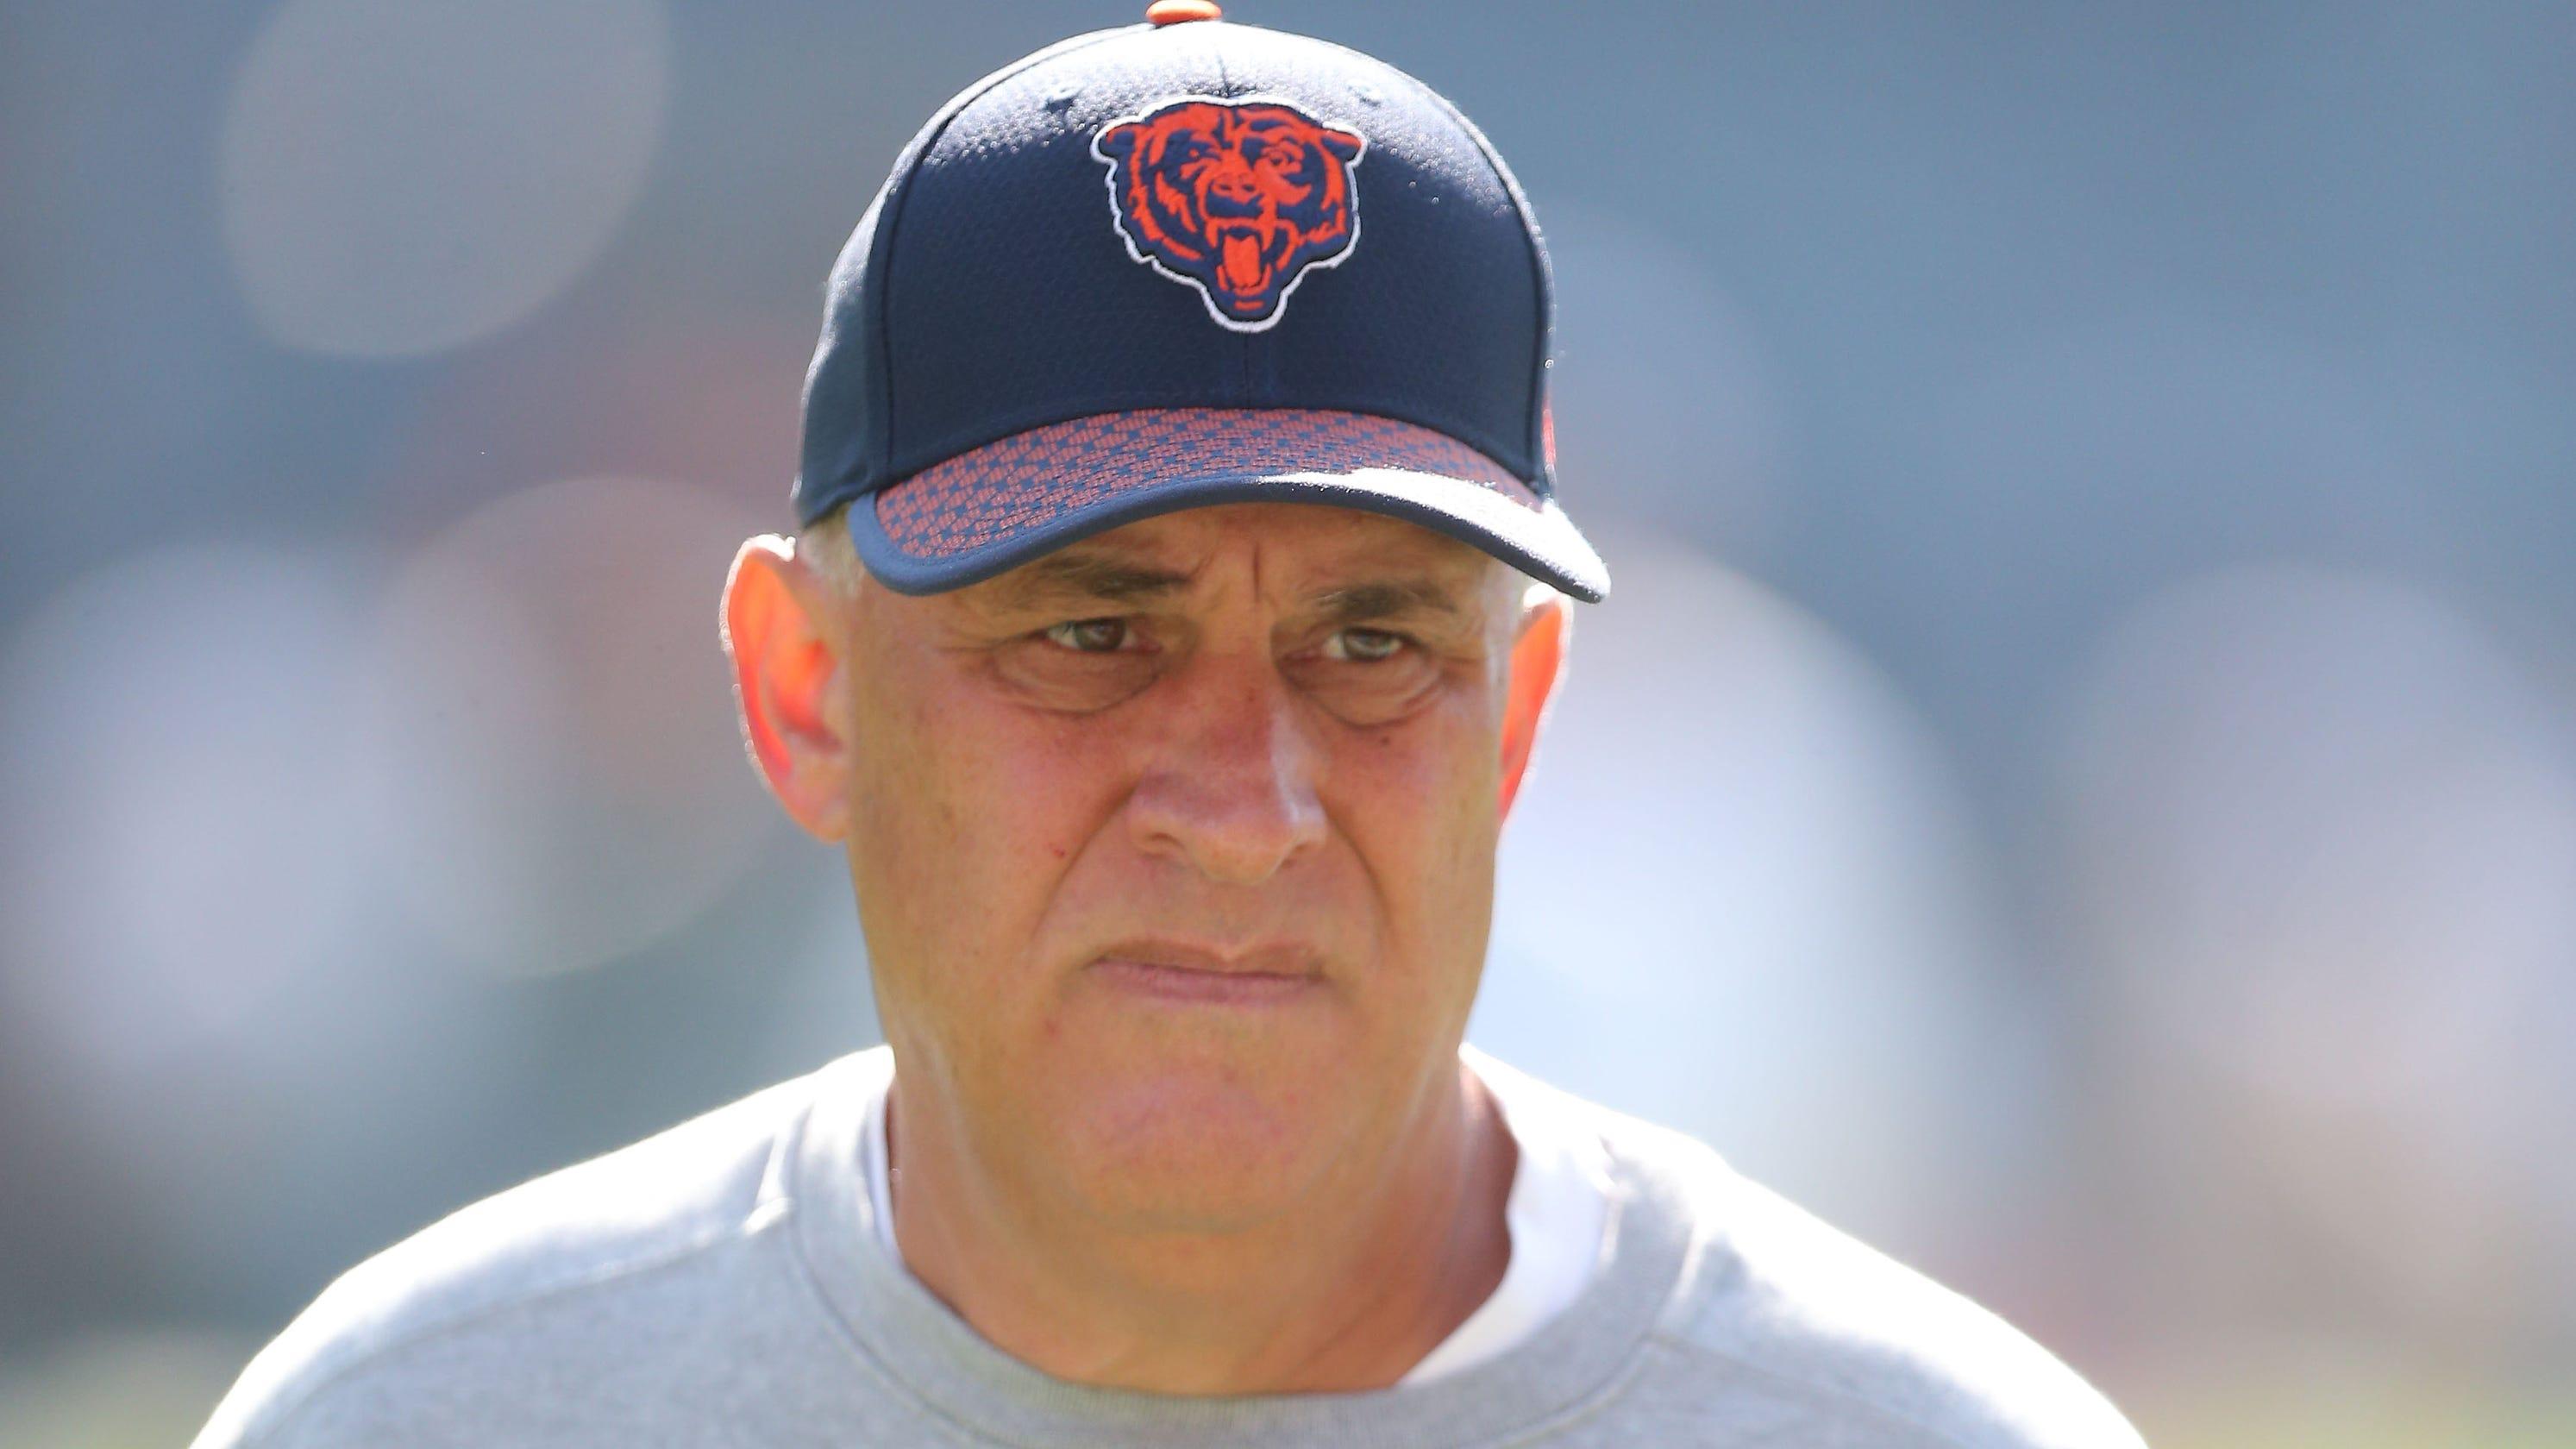 Broncos hire Bears defensive coordinator Vic Fangio as new head coach ff1c0f764